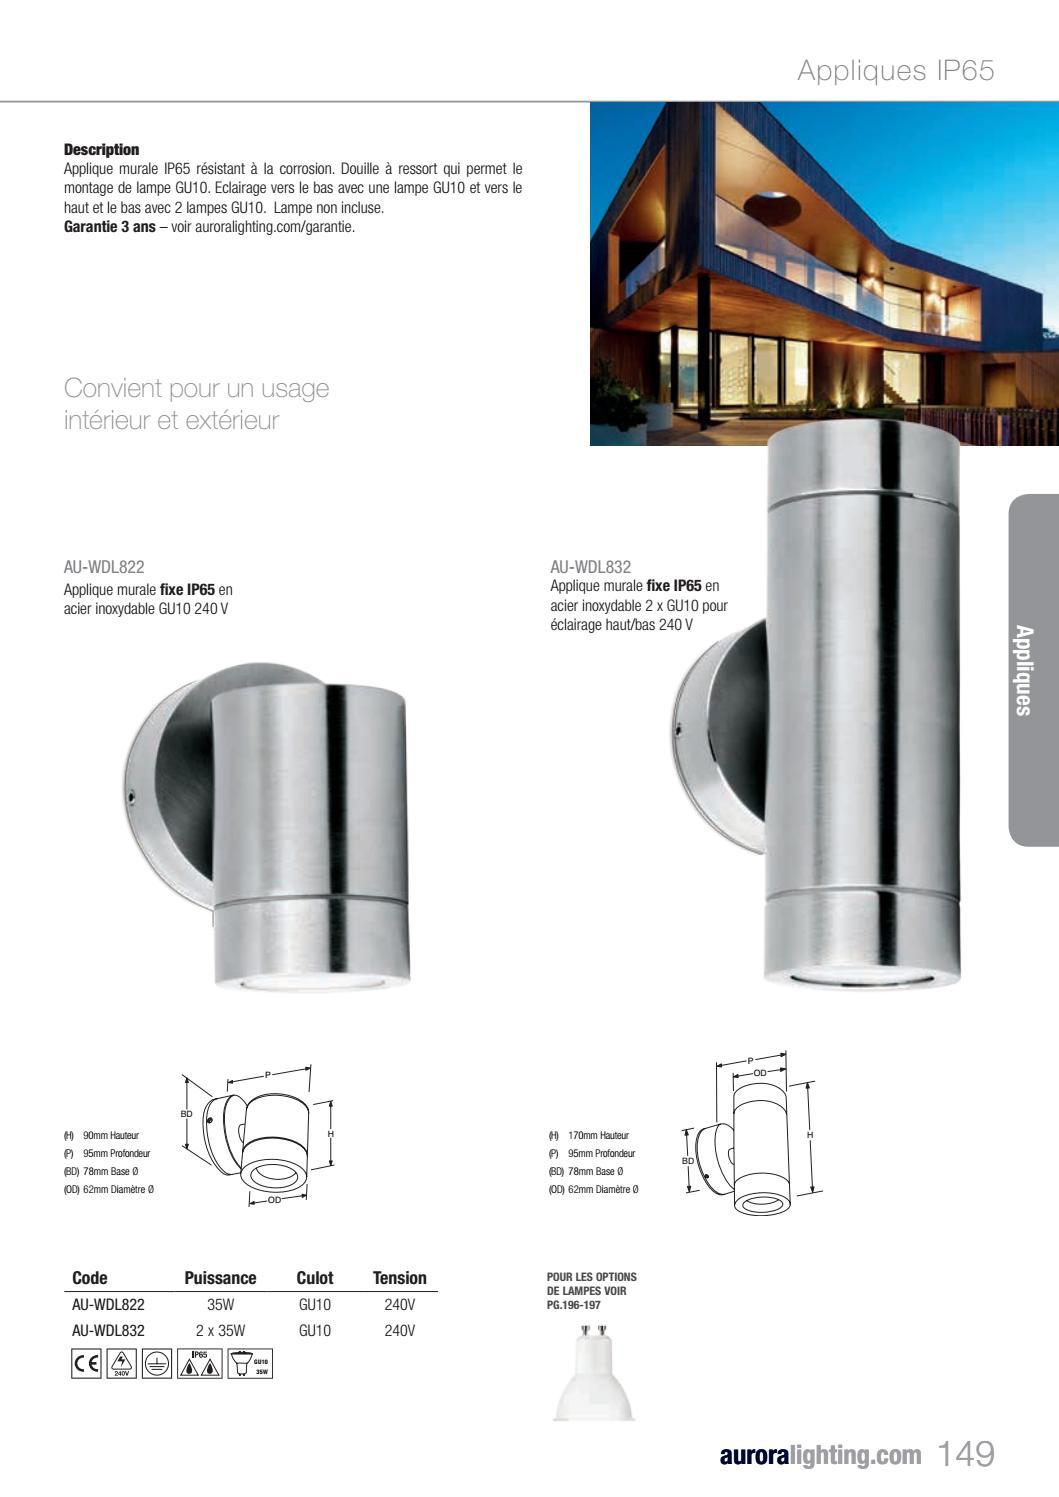 Applique Extérieure Eclairage Haut Et Bas lighting 2 0 trade - franceaurora lighting - issuu